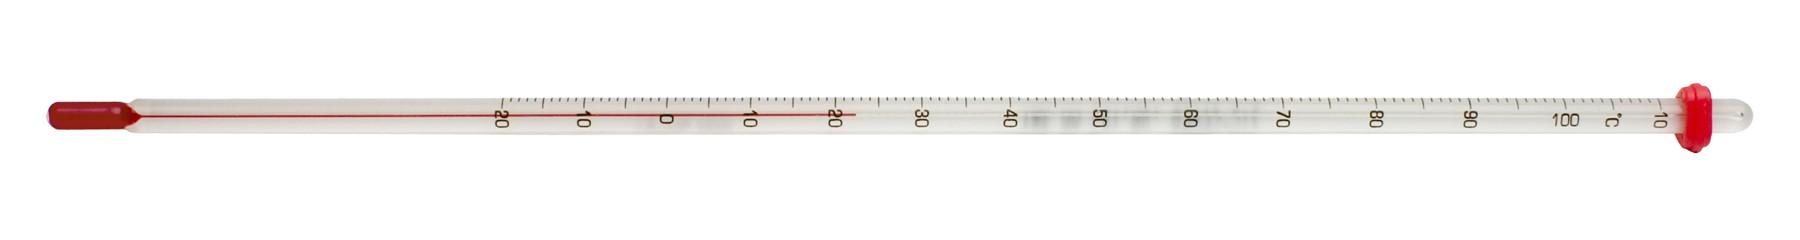 H-B DURAC General Purpose Liquid-In-Glass Laboratory Thermometers, Organic Liquid Fill